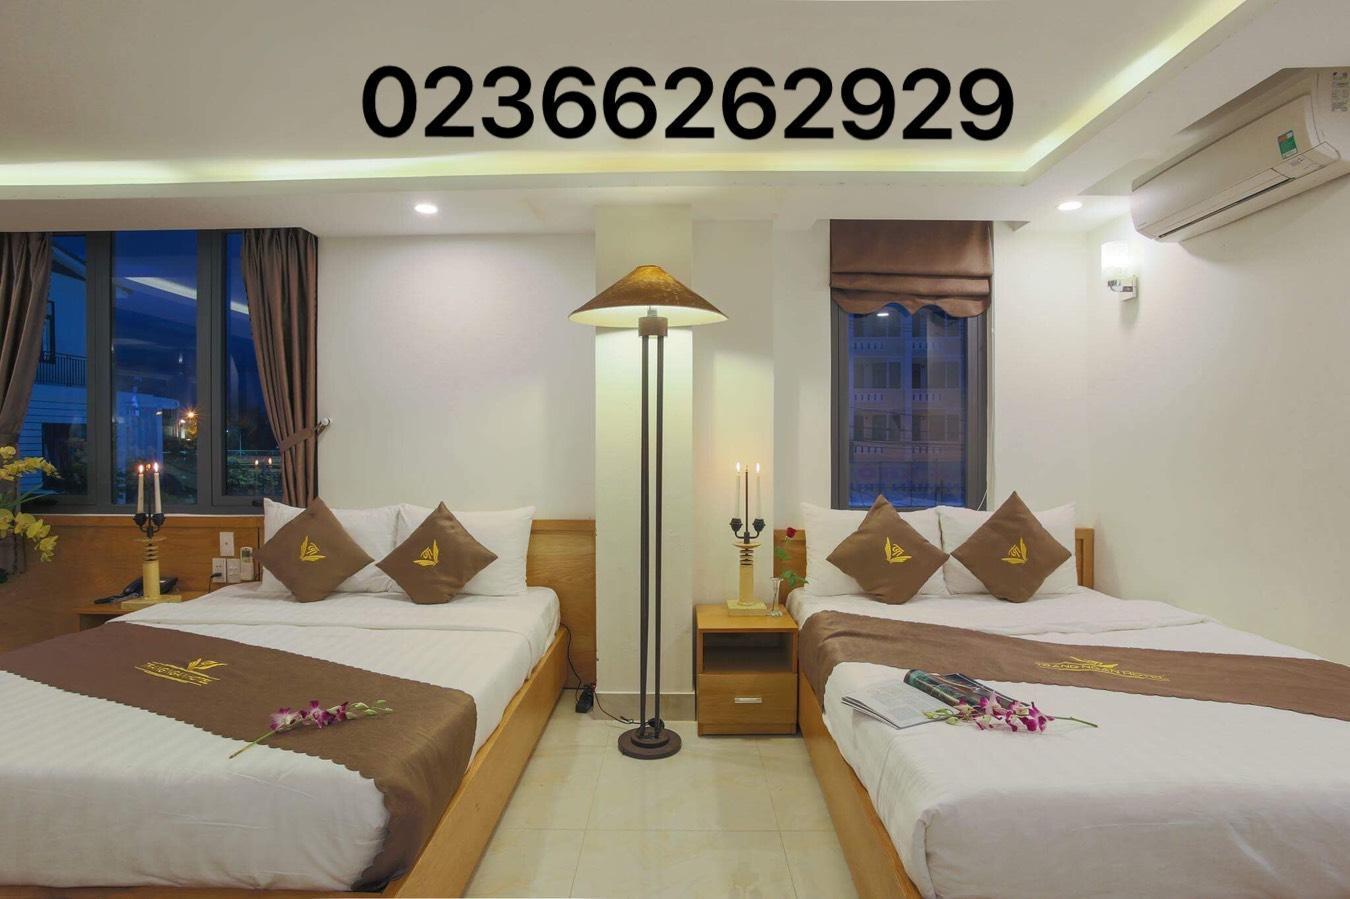 Trang Ngan Hotel Da Nang